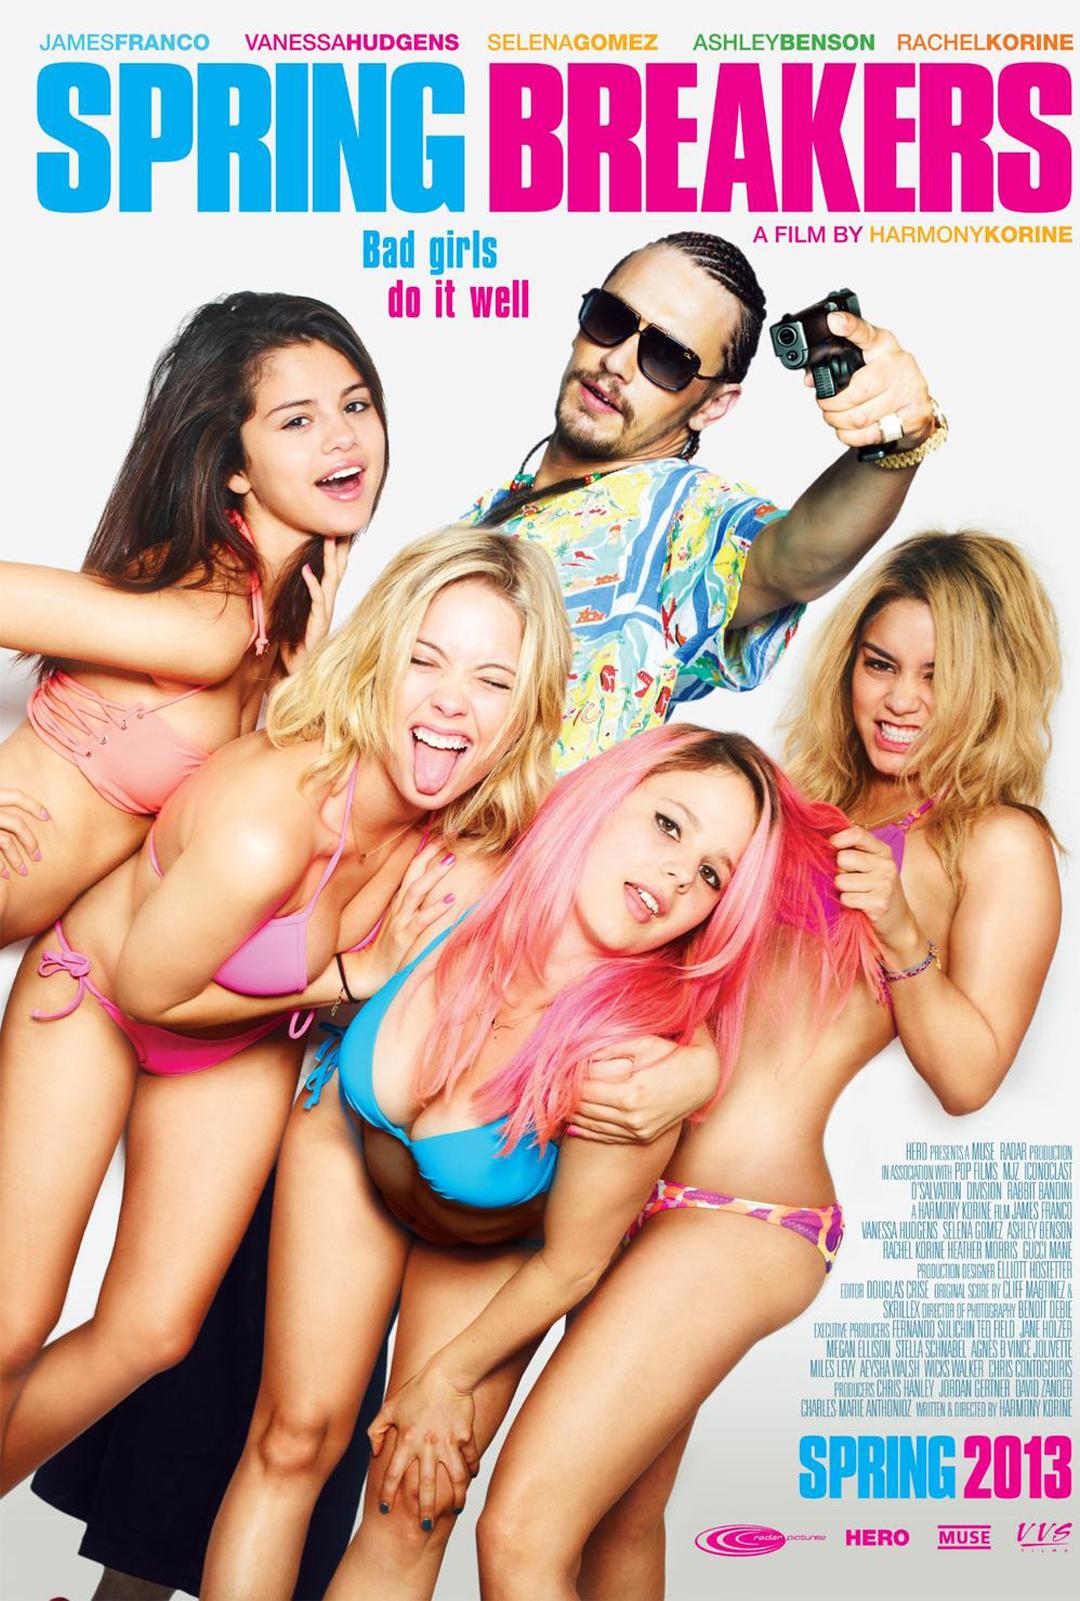 Spring Breakers - Movie Poster #3 (Original)